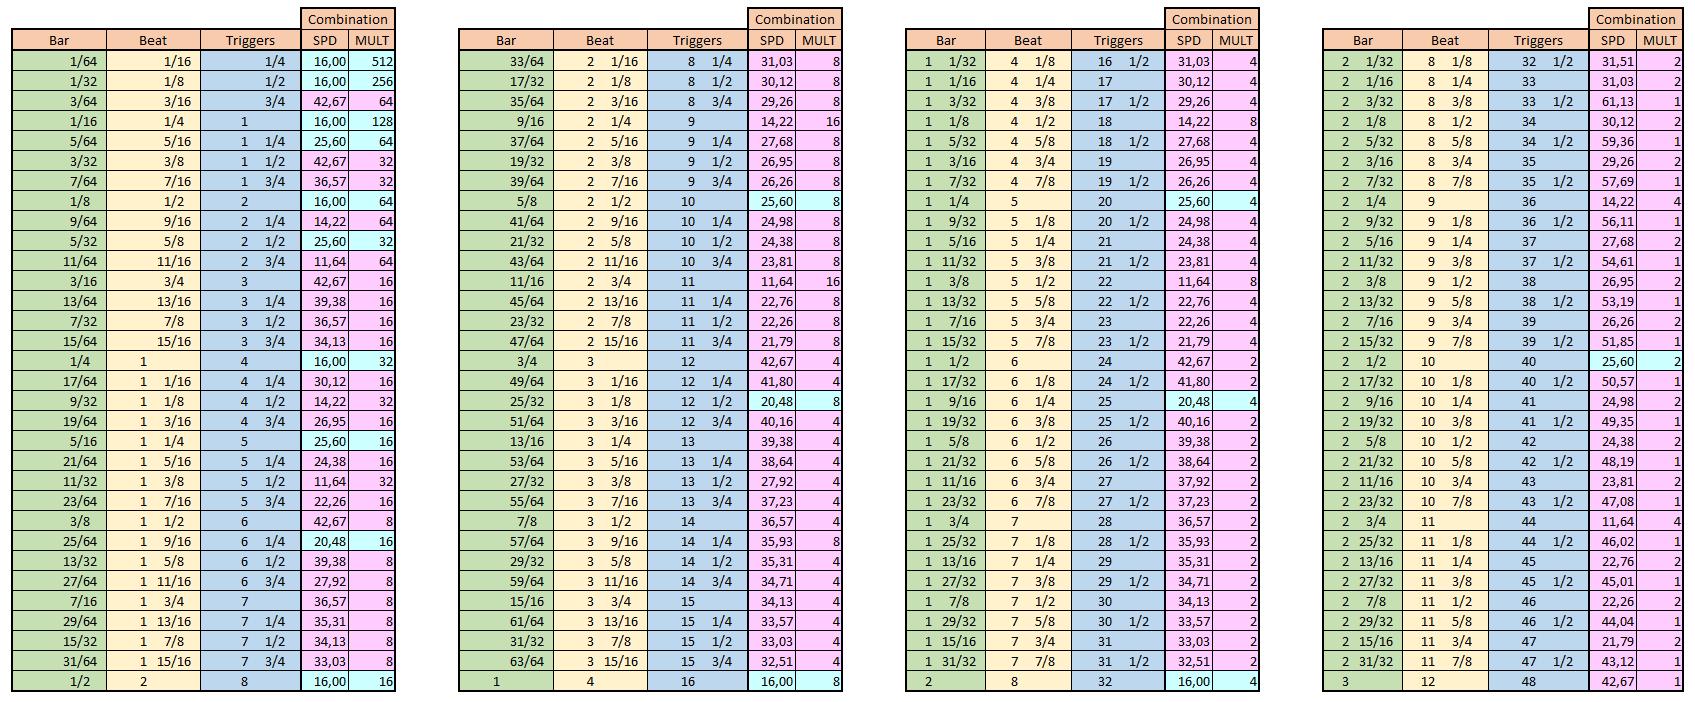 LFO%20Cycle%20per%20trig%2001